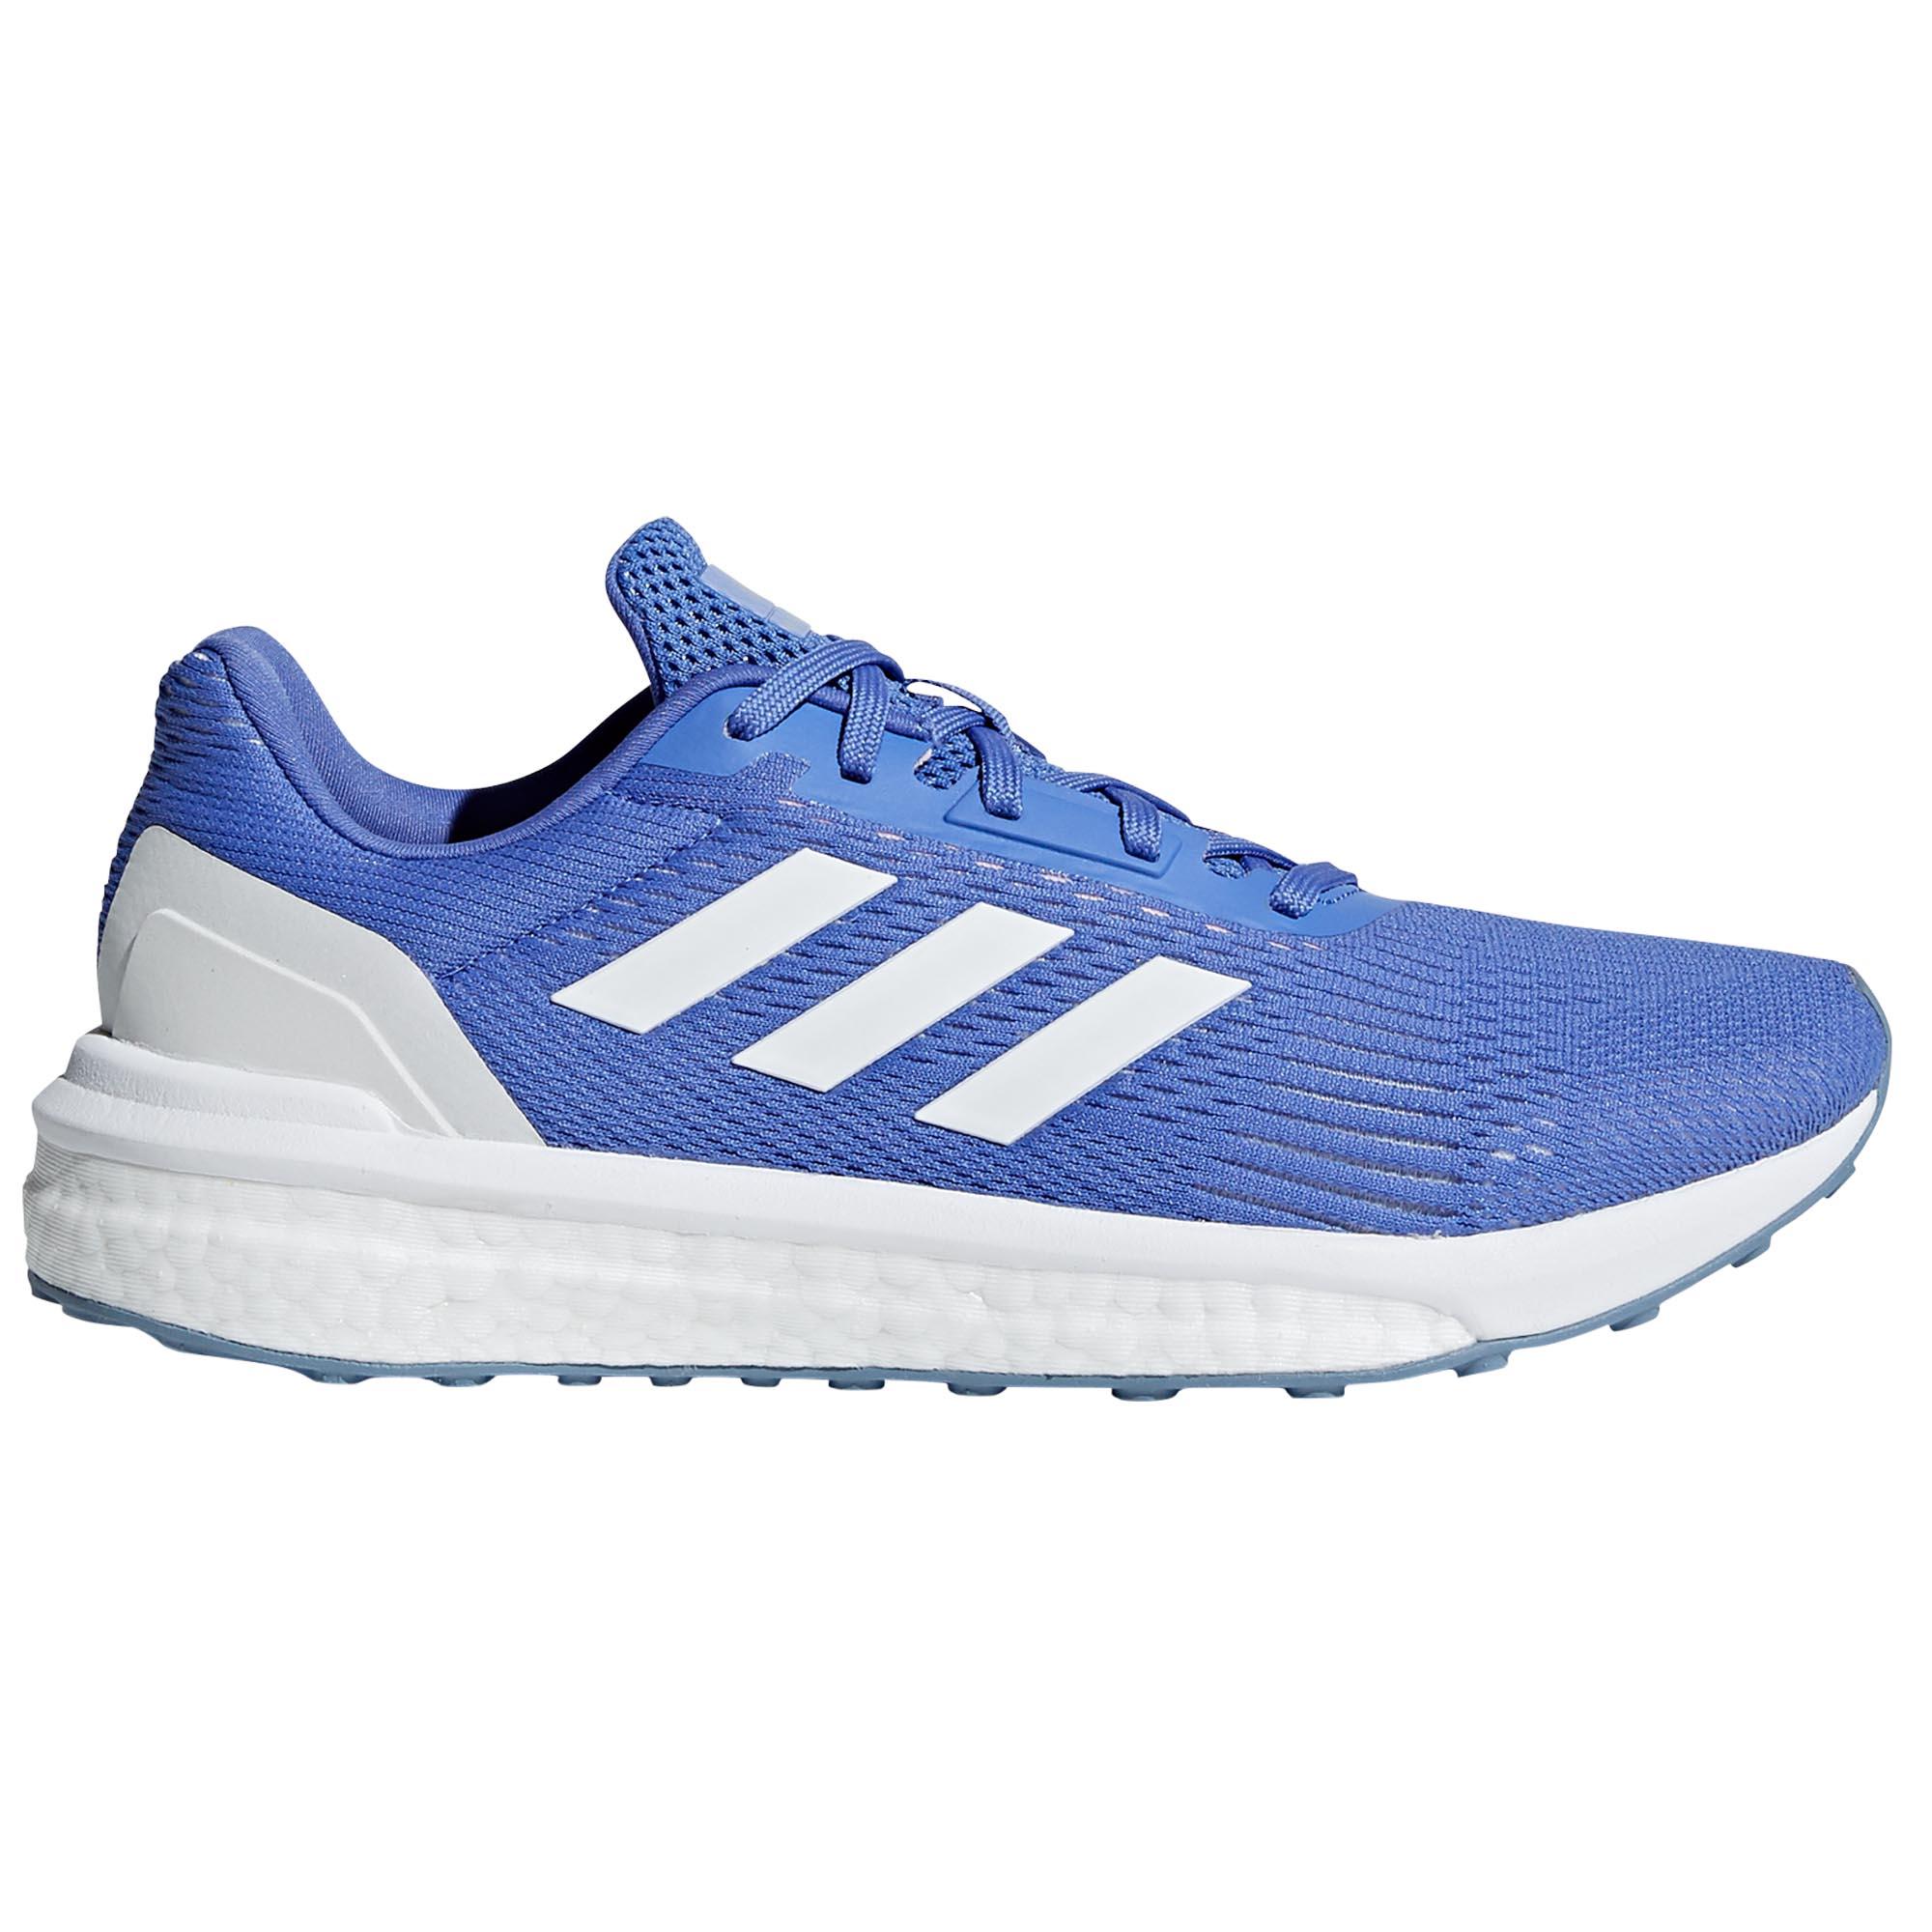 Adidas Drive Solar Drive Adidas ST Damenschuhe Running Fitness Trainer Schuhe Lilac/Weiß 8ba741